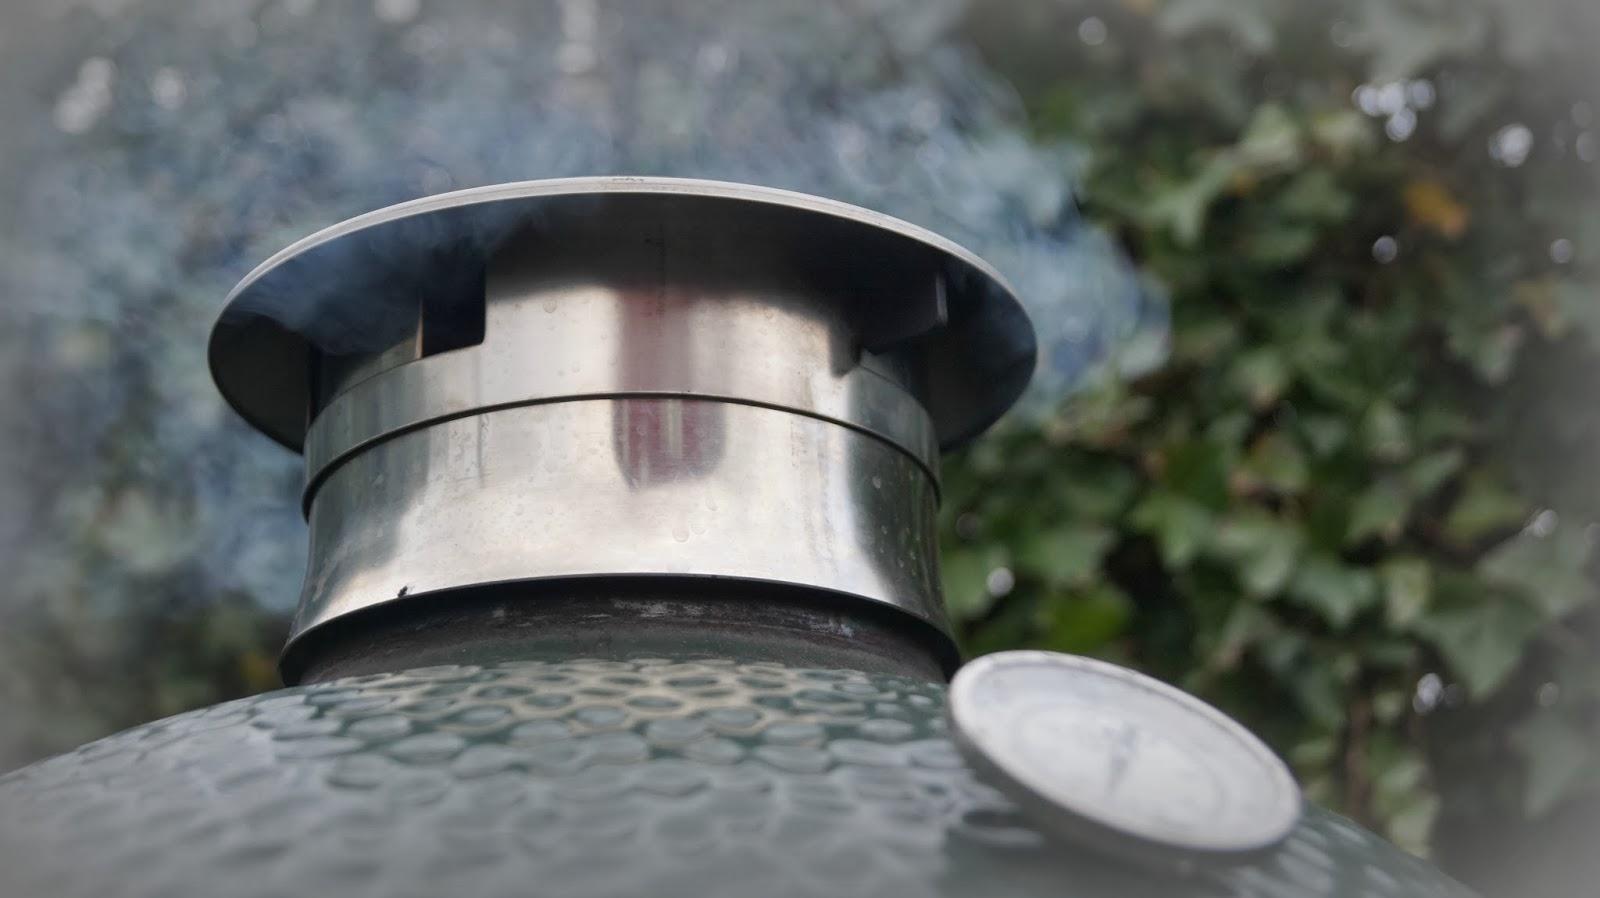 Pitmaster X Chimney Cap From Smokeware